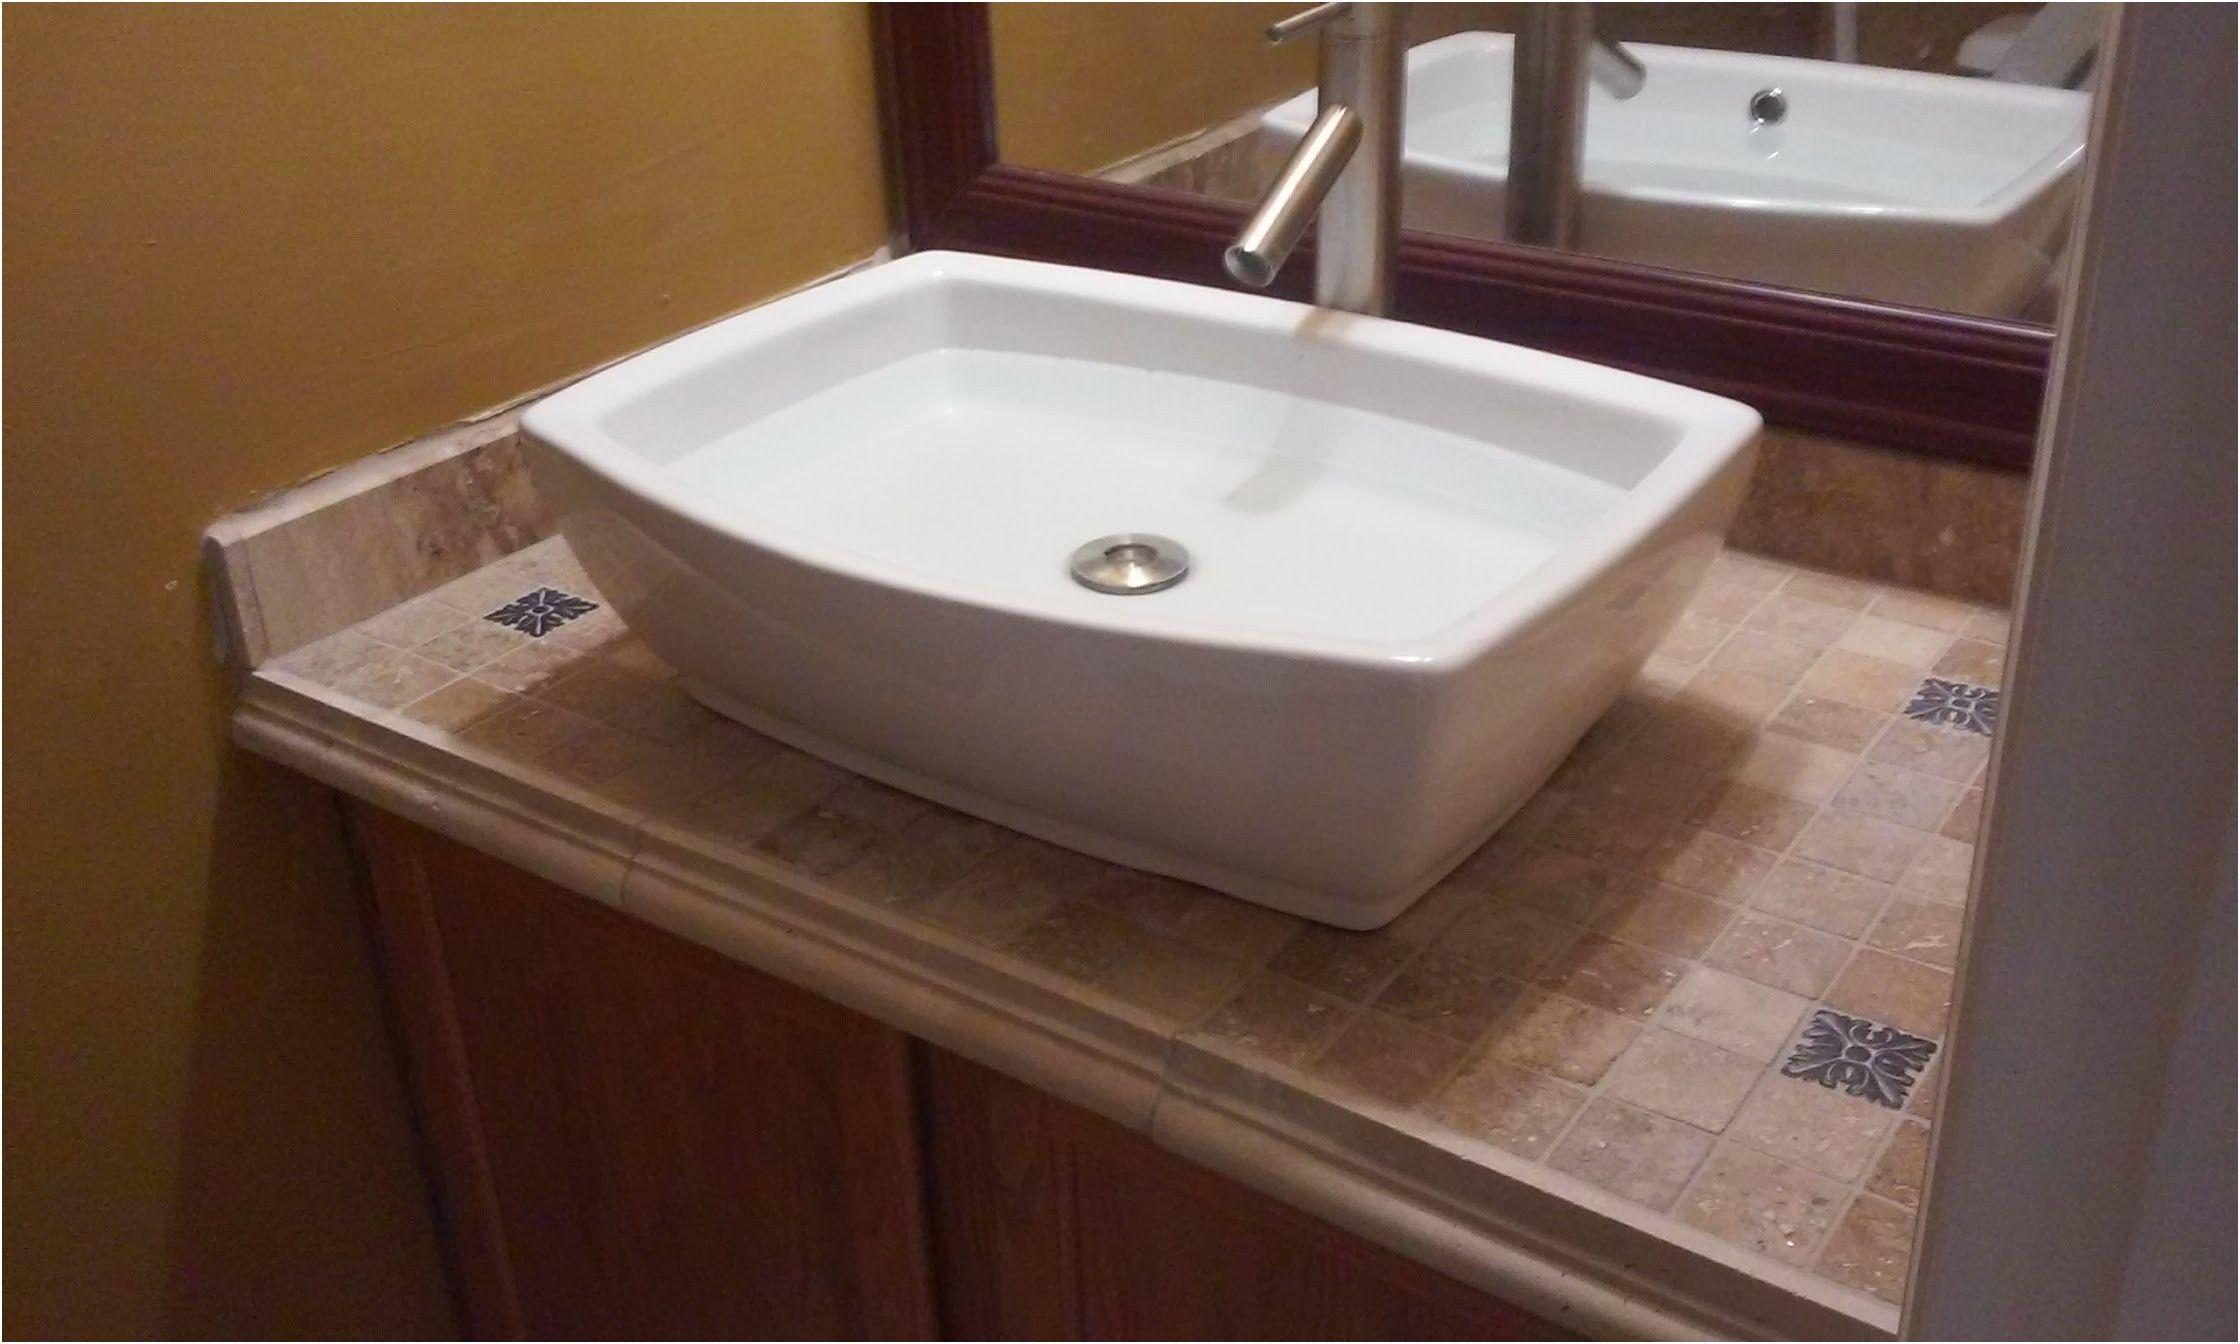 Vanity Top Tiled Mounted Sink You From Bathroom Mount